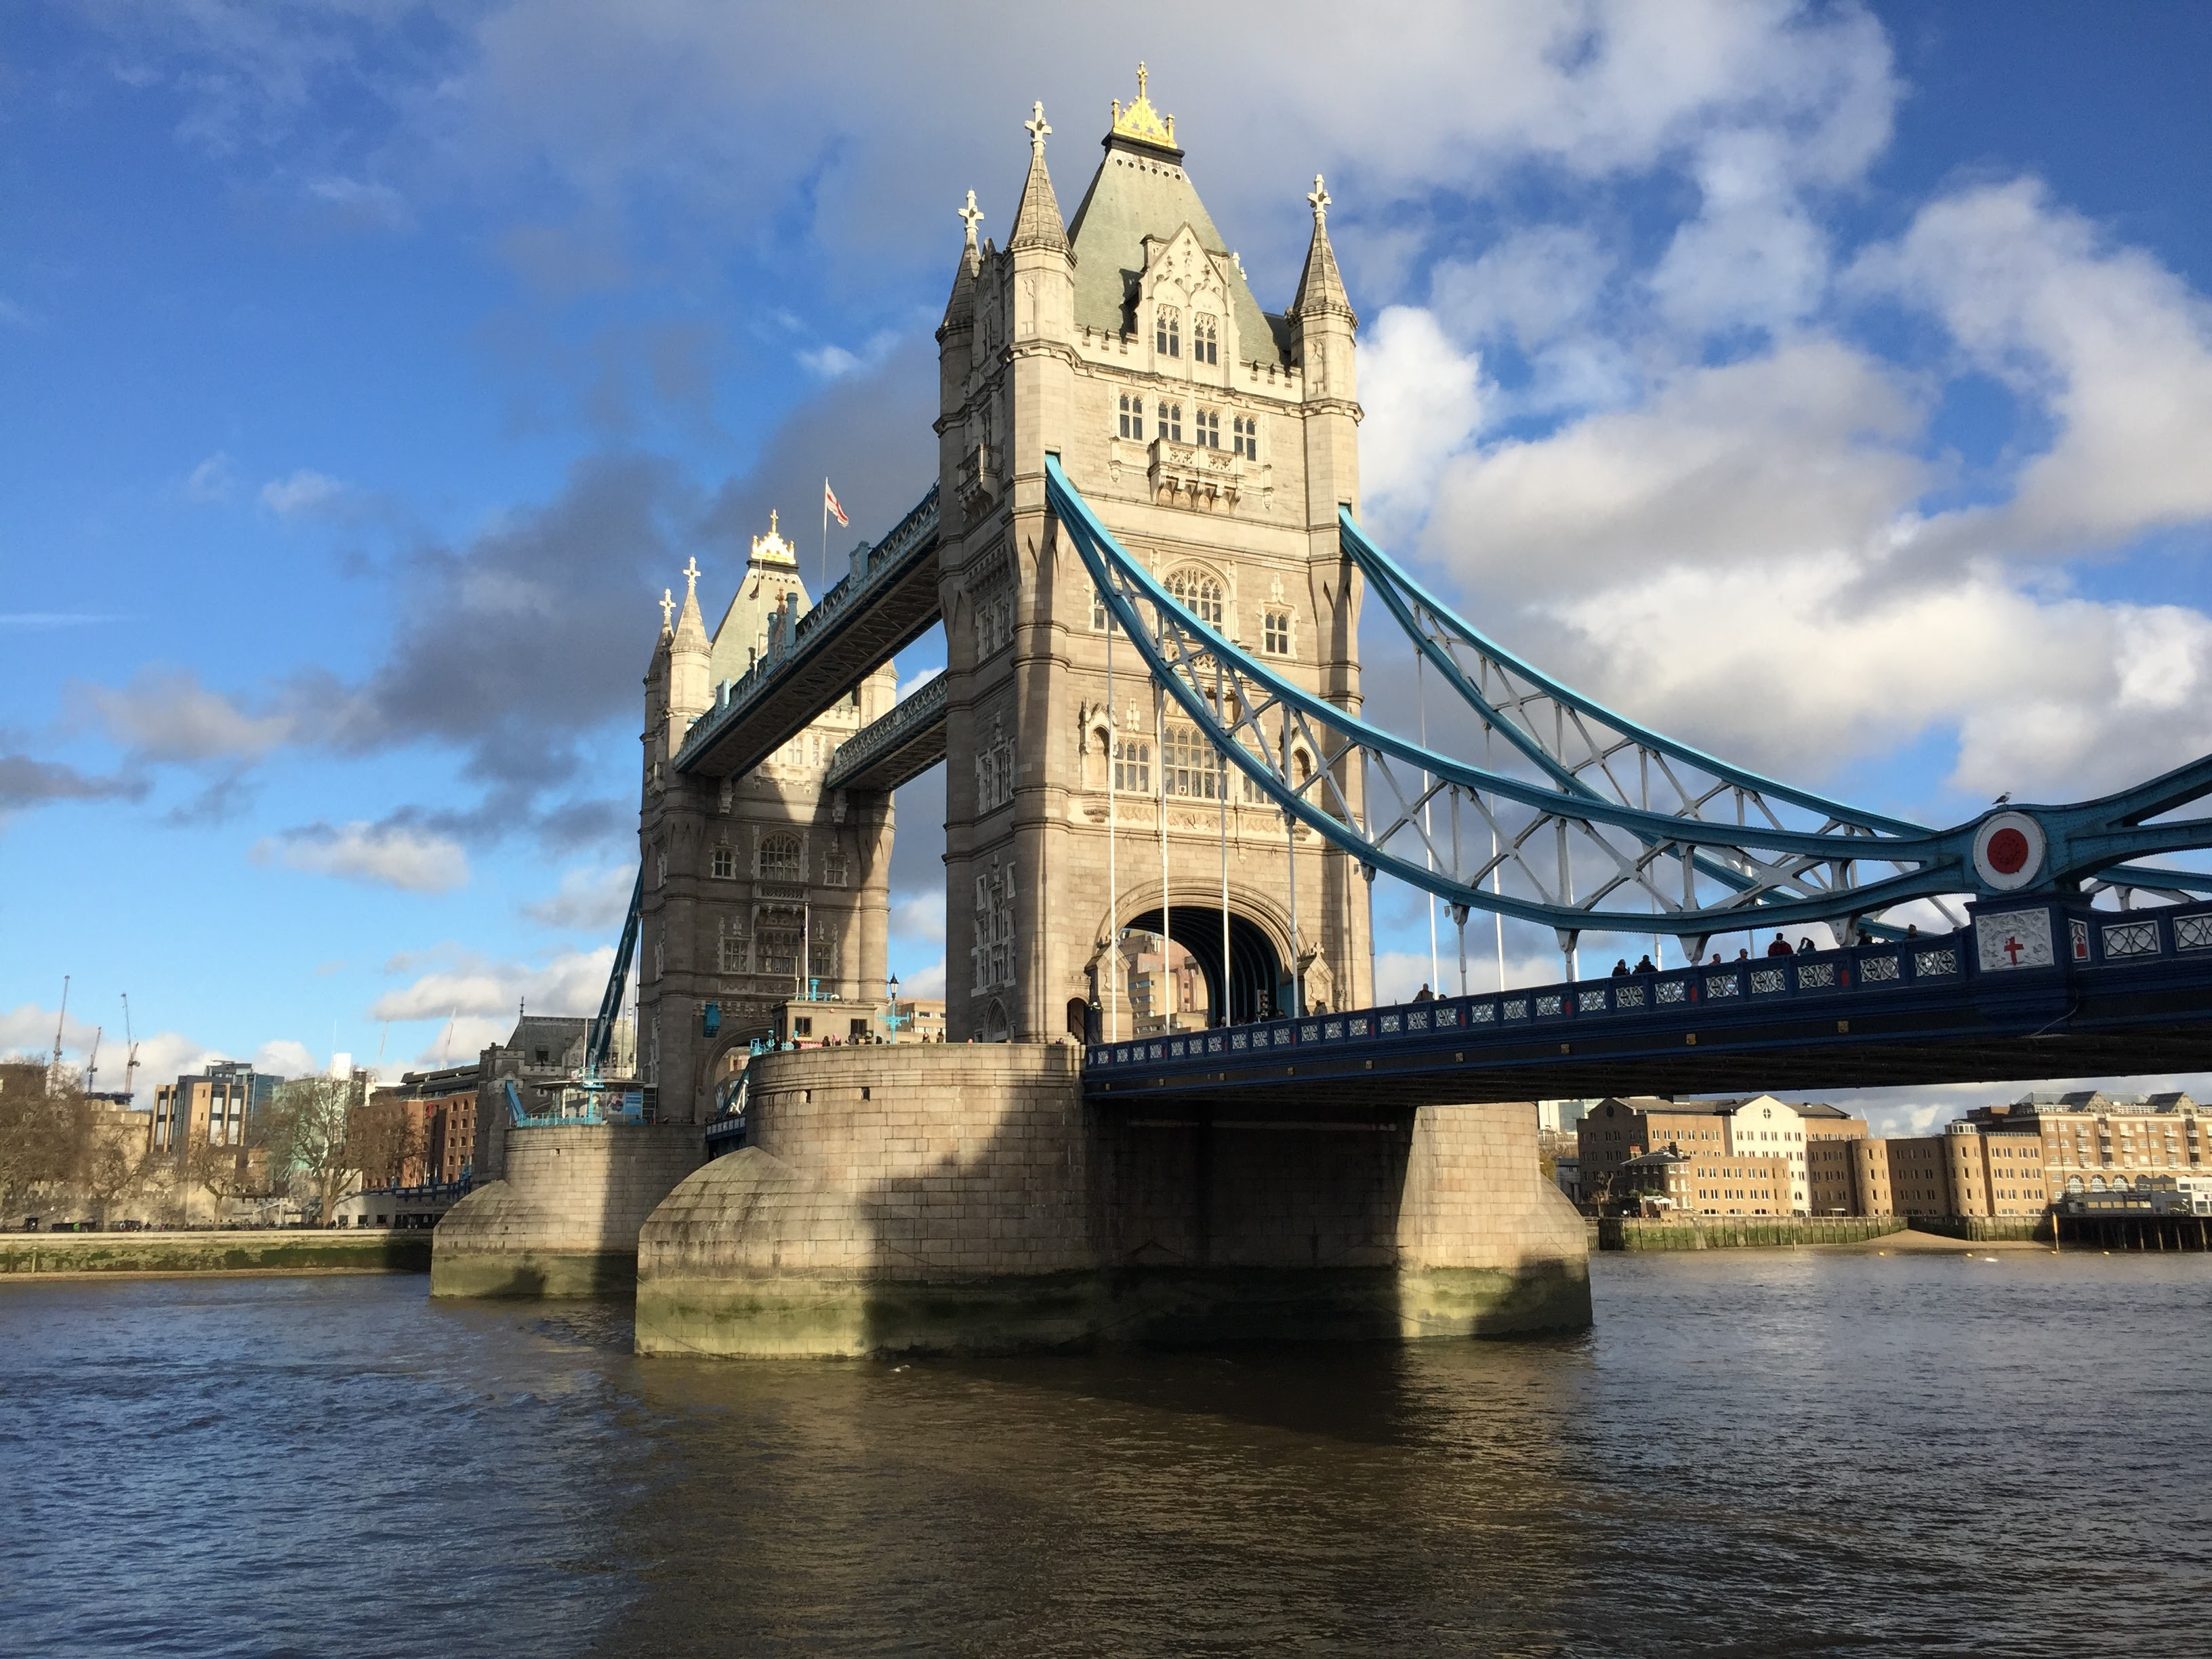 Тауэрский мост или Тауэр-бридж (Tower Bridge), Лондон, Великобритания